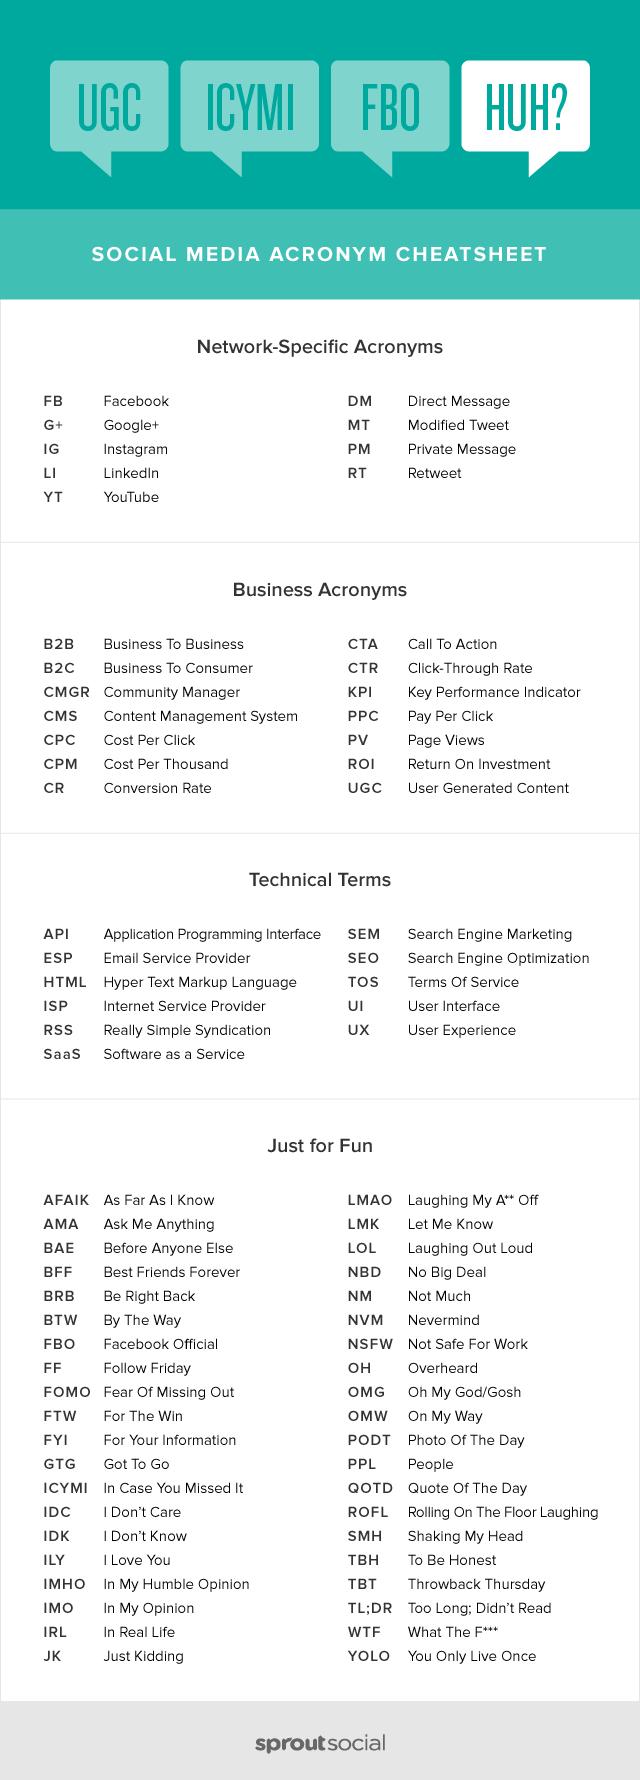 list of social media acronyms cheatsheet